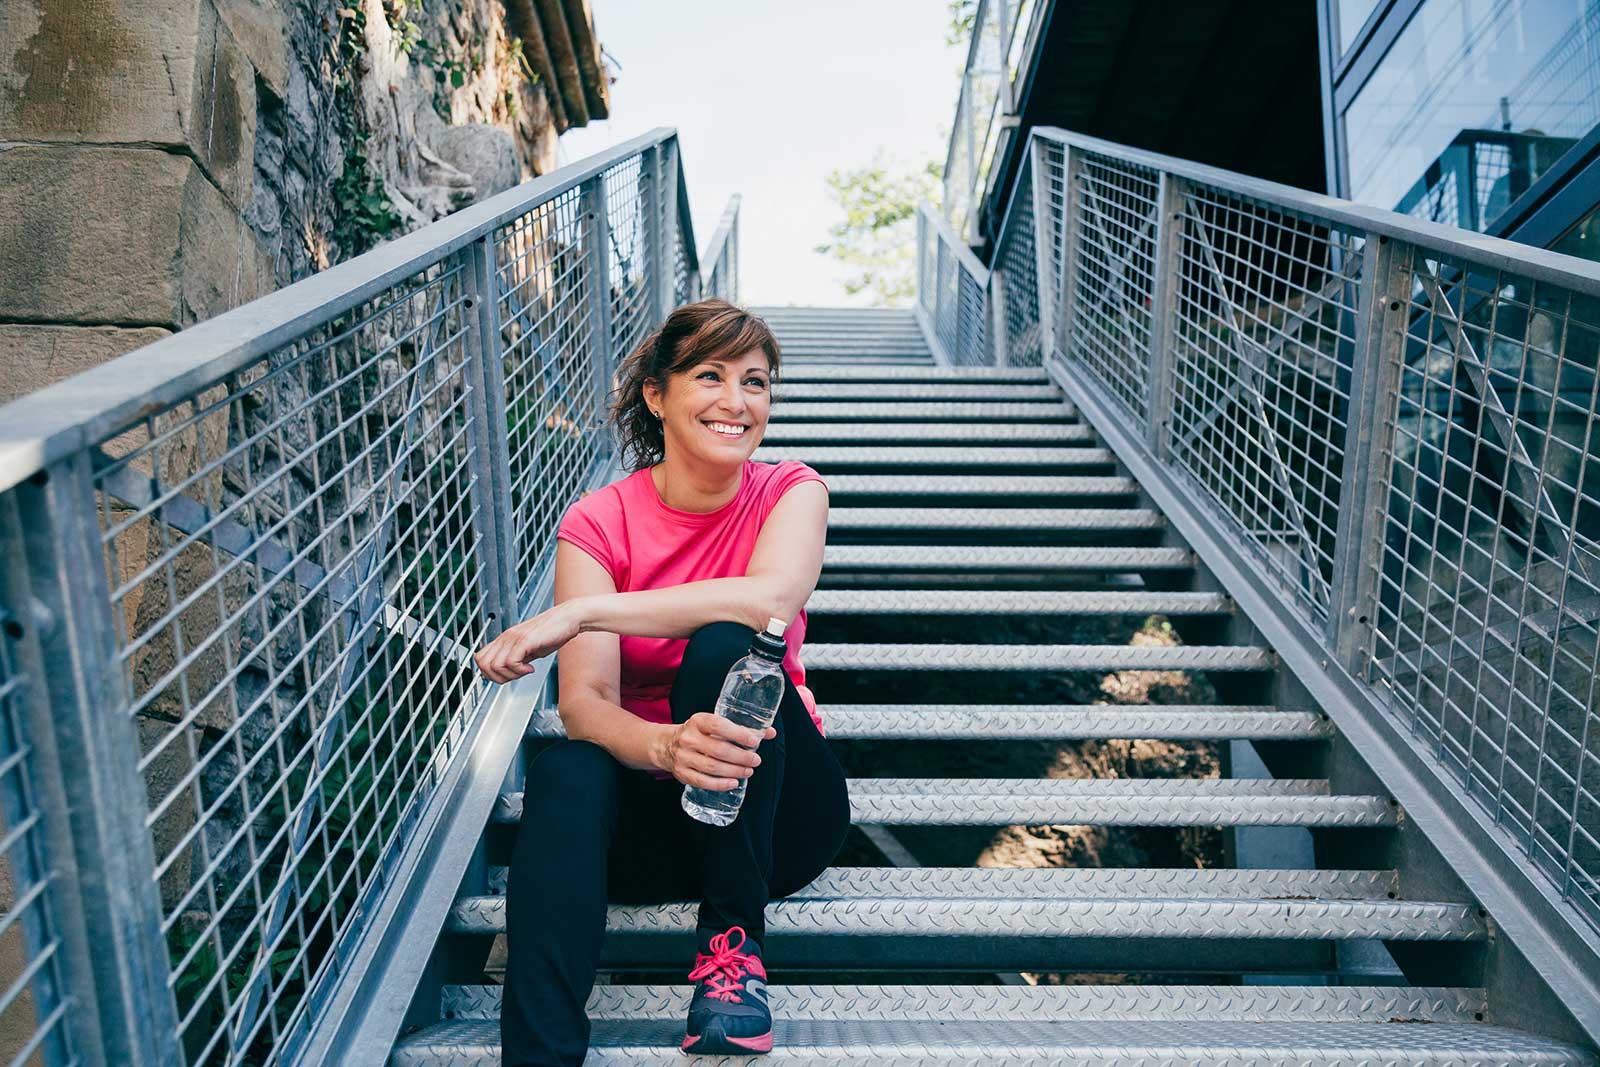 woman-runner-sitting-on-steps